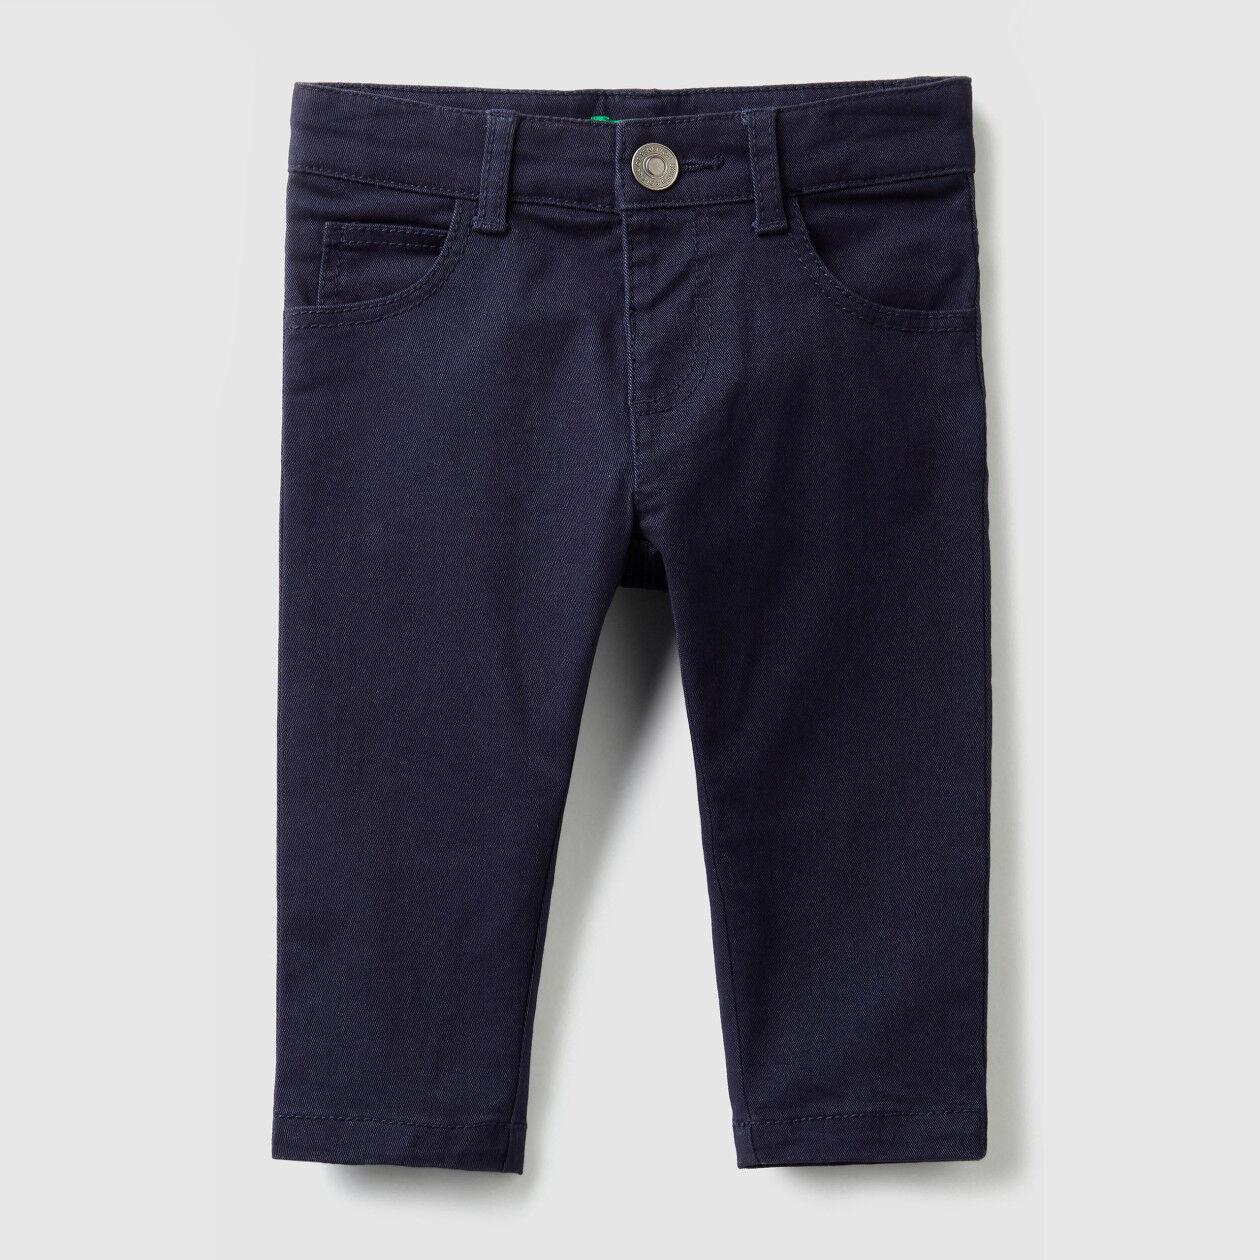 Slim fit stretch pants